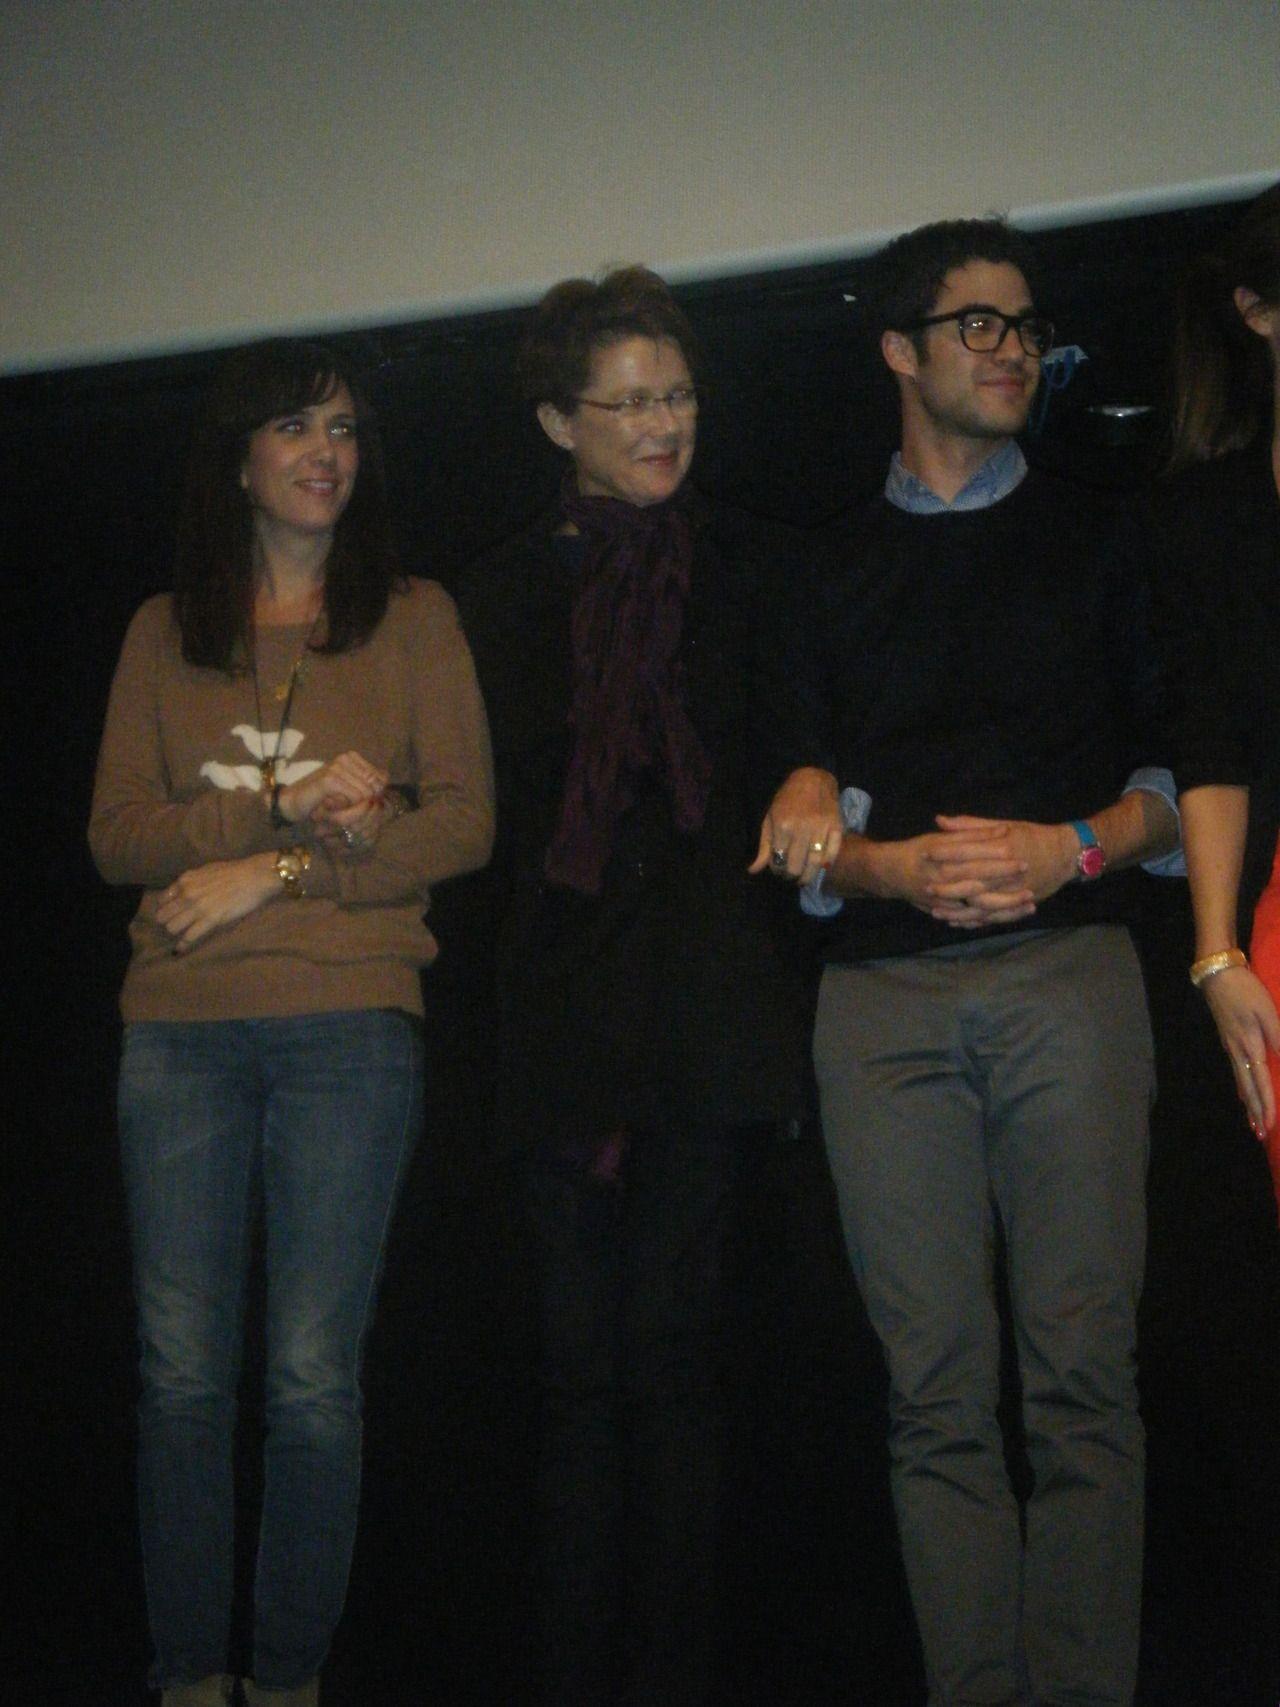 Darren, Annette Bening, and Kristen Wiig at the Imogene screening at TIFF in Toronto on Sept. 8th